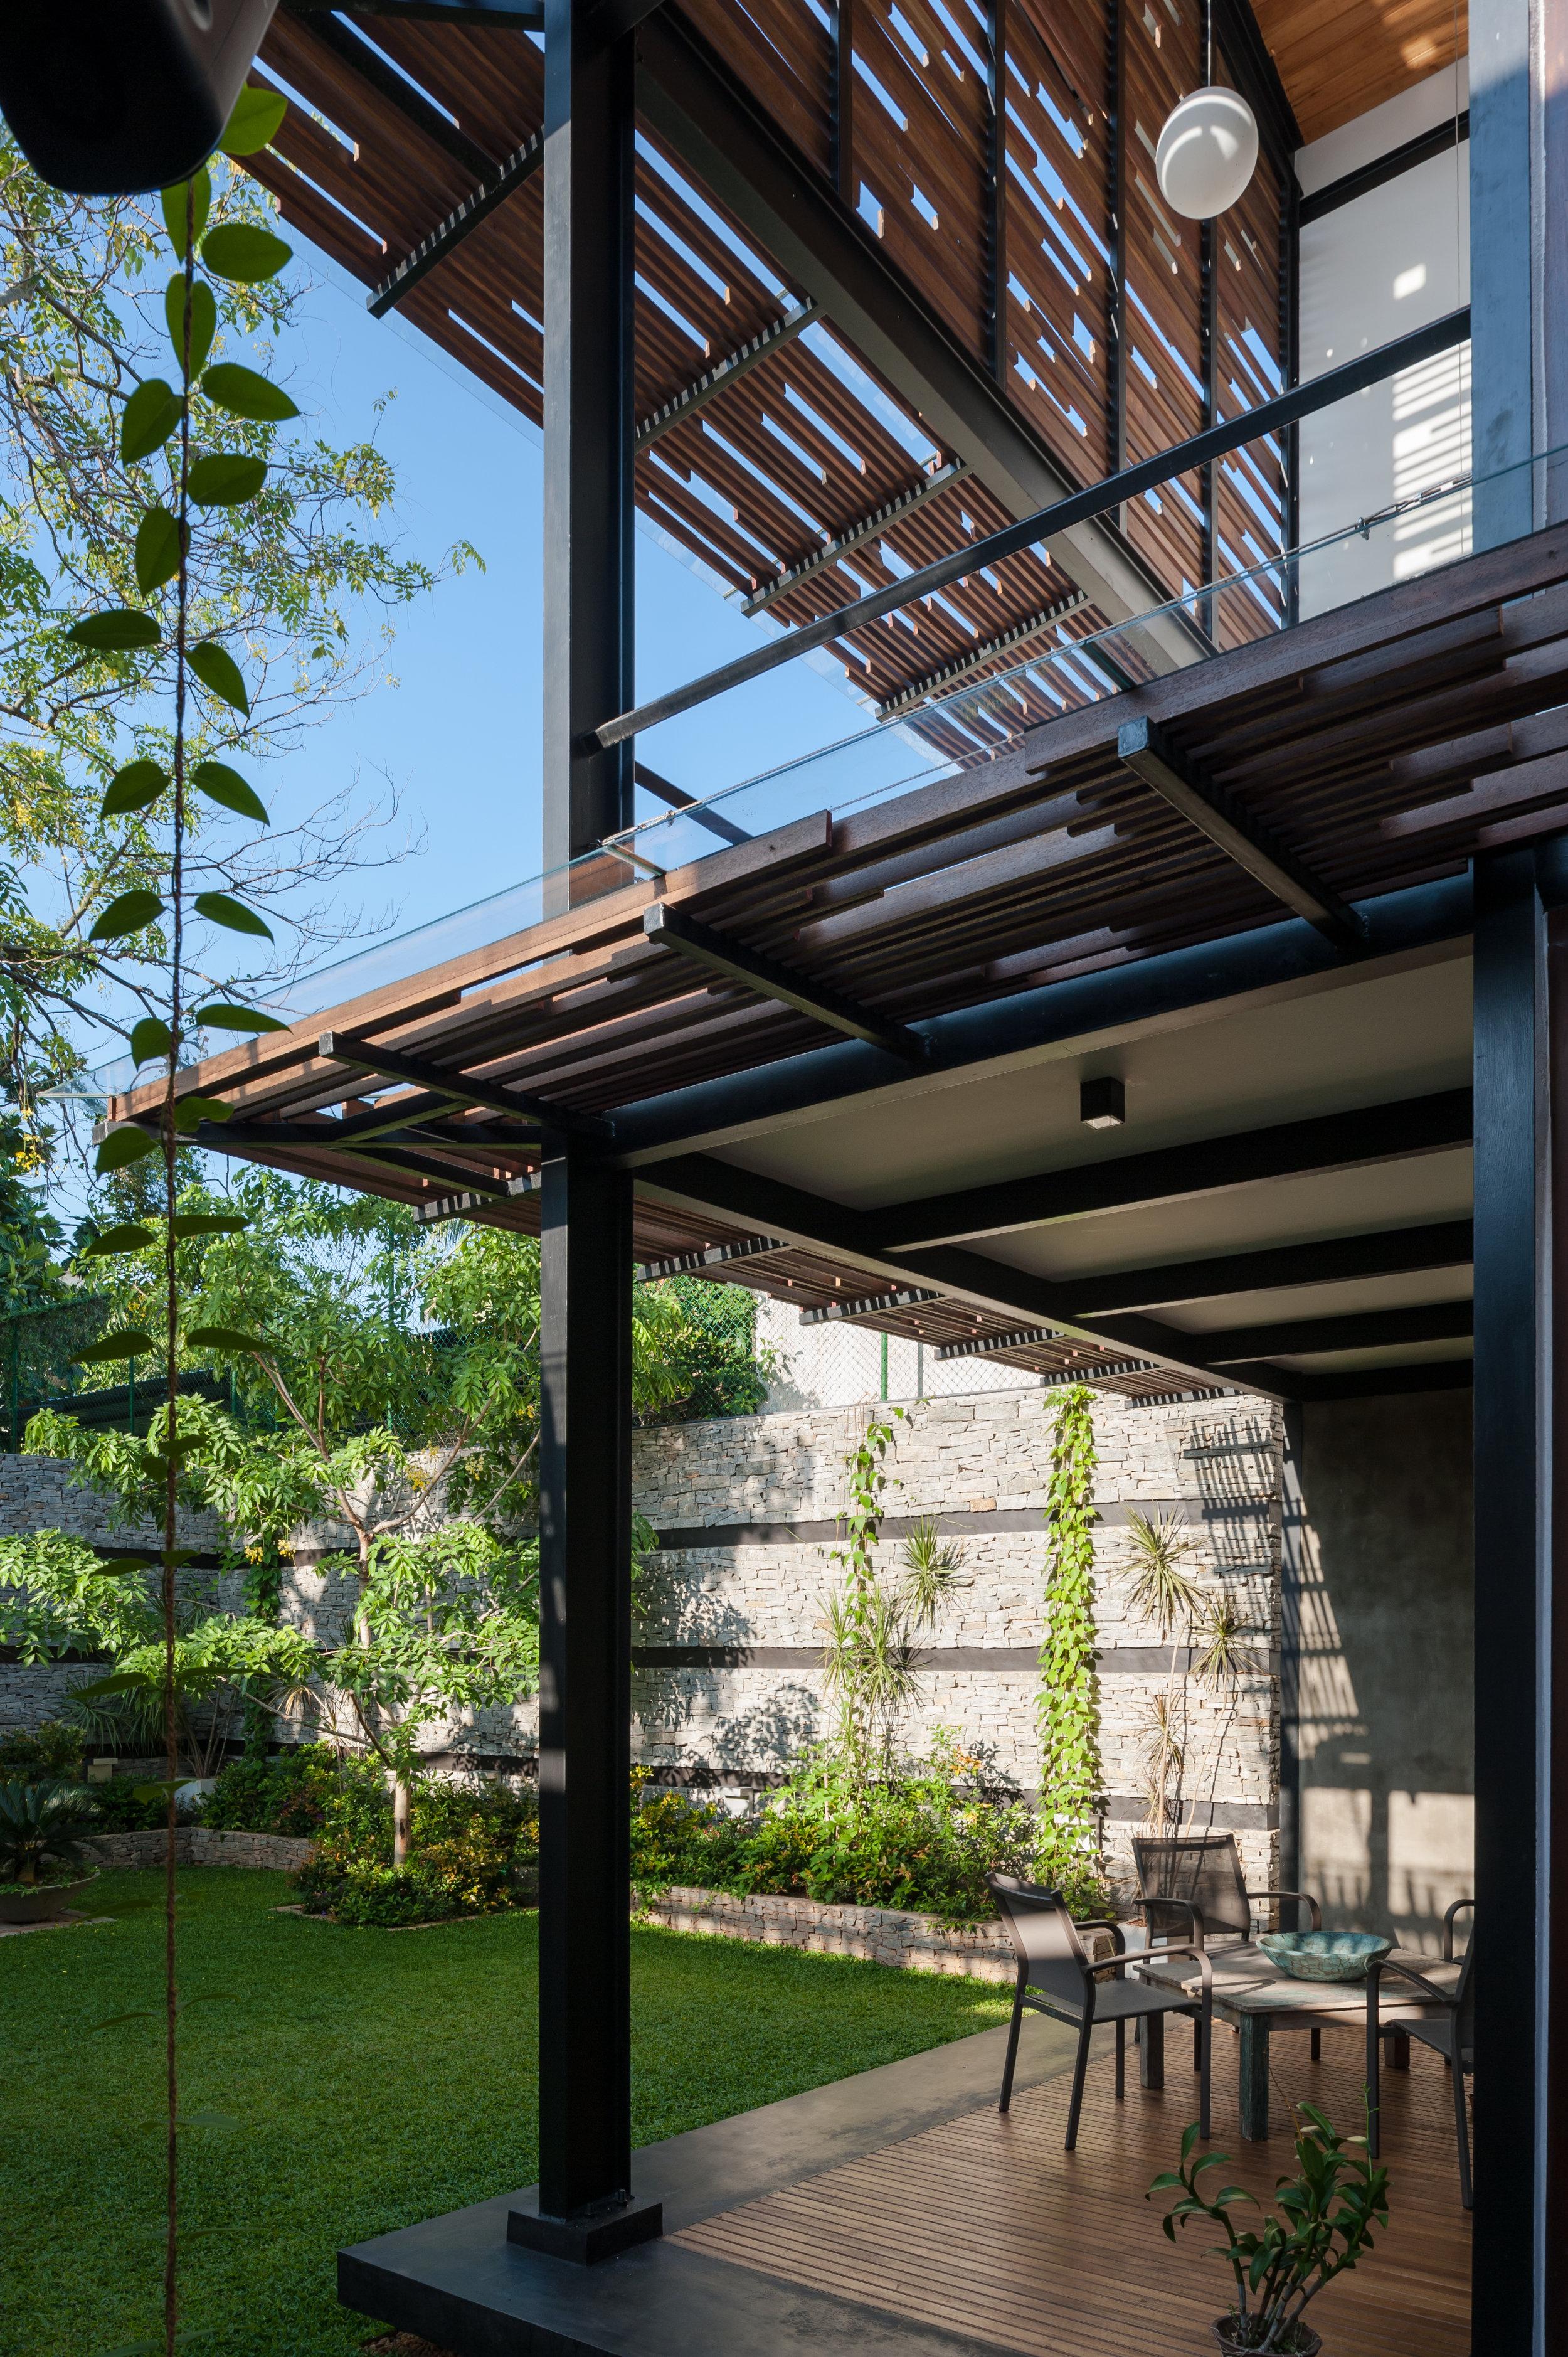 House No. 8 - verandah and backyard